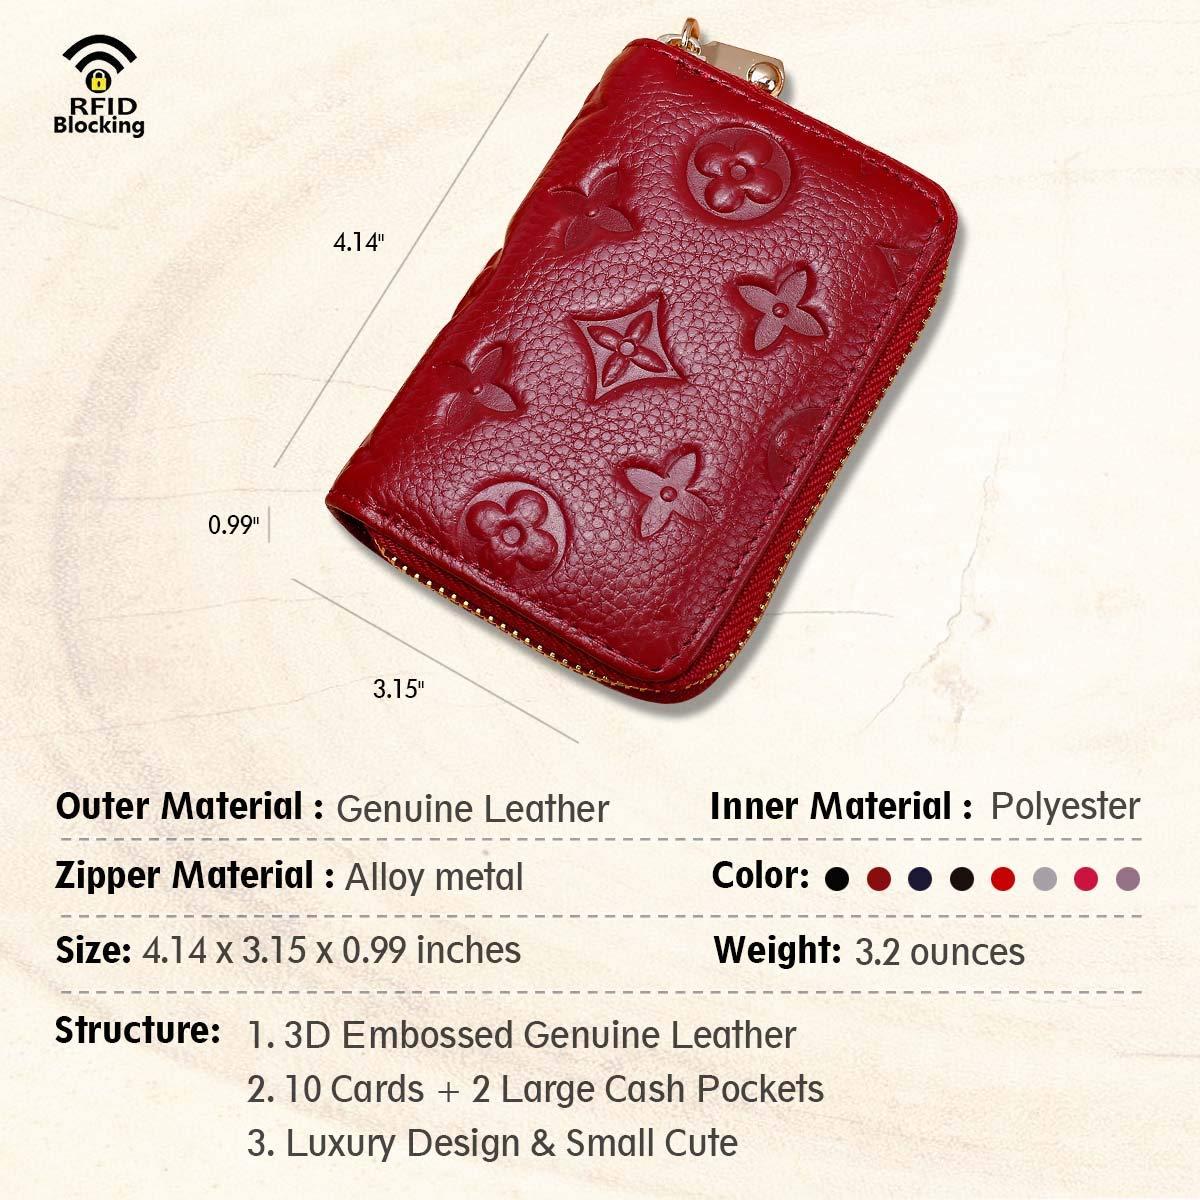 Auner Womens Wallet RFID Blocking Genuine Leather Multi Credit Card Holder Zipper Small Wallets - Dark Red by Auner (Image #3)